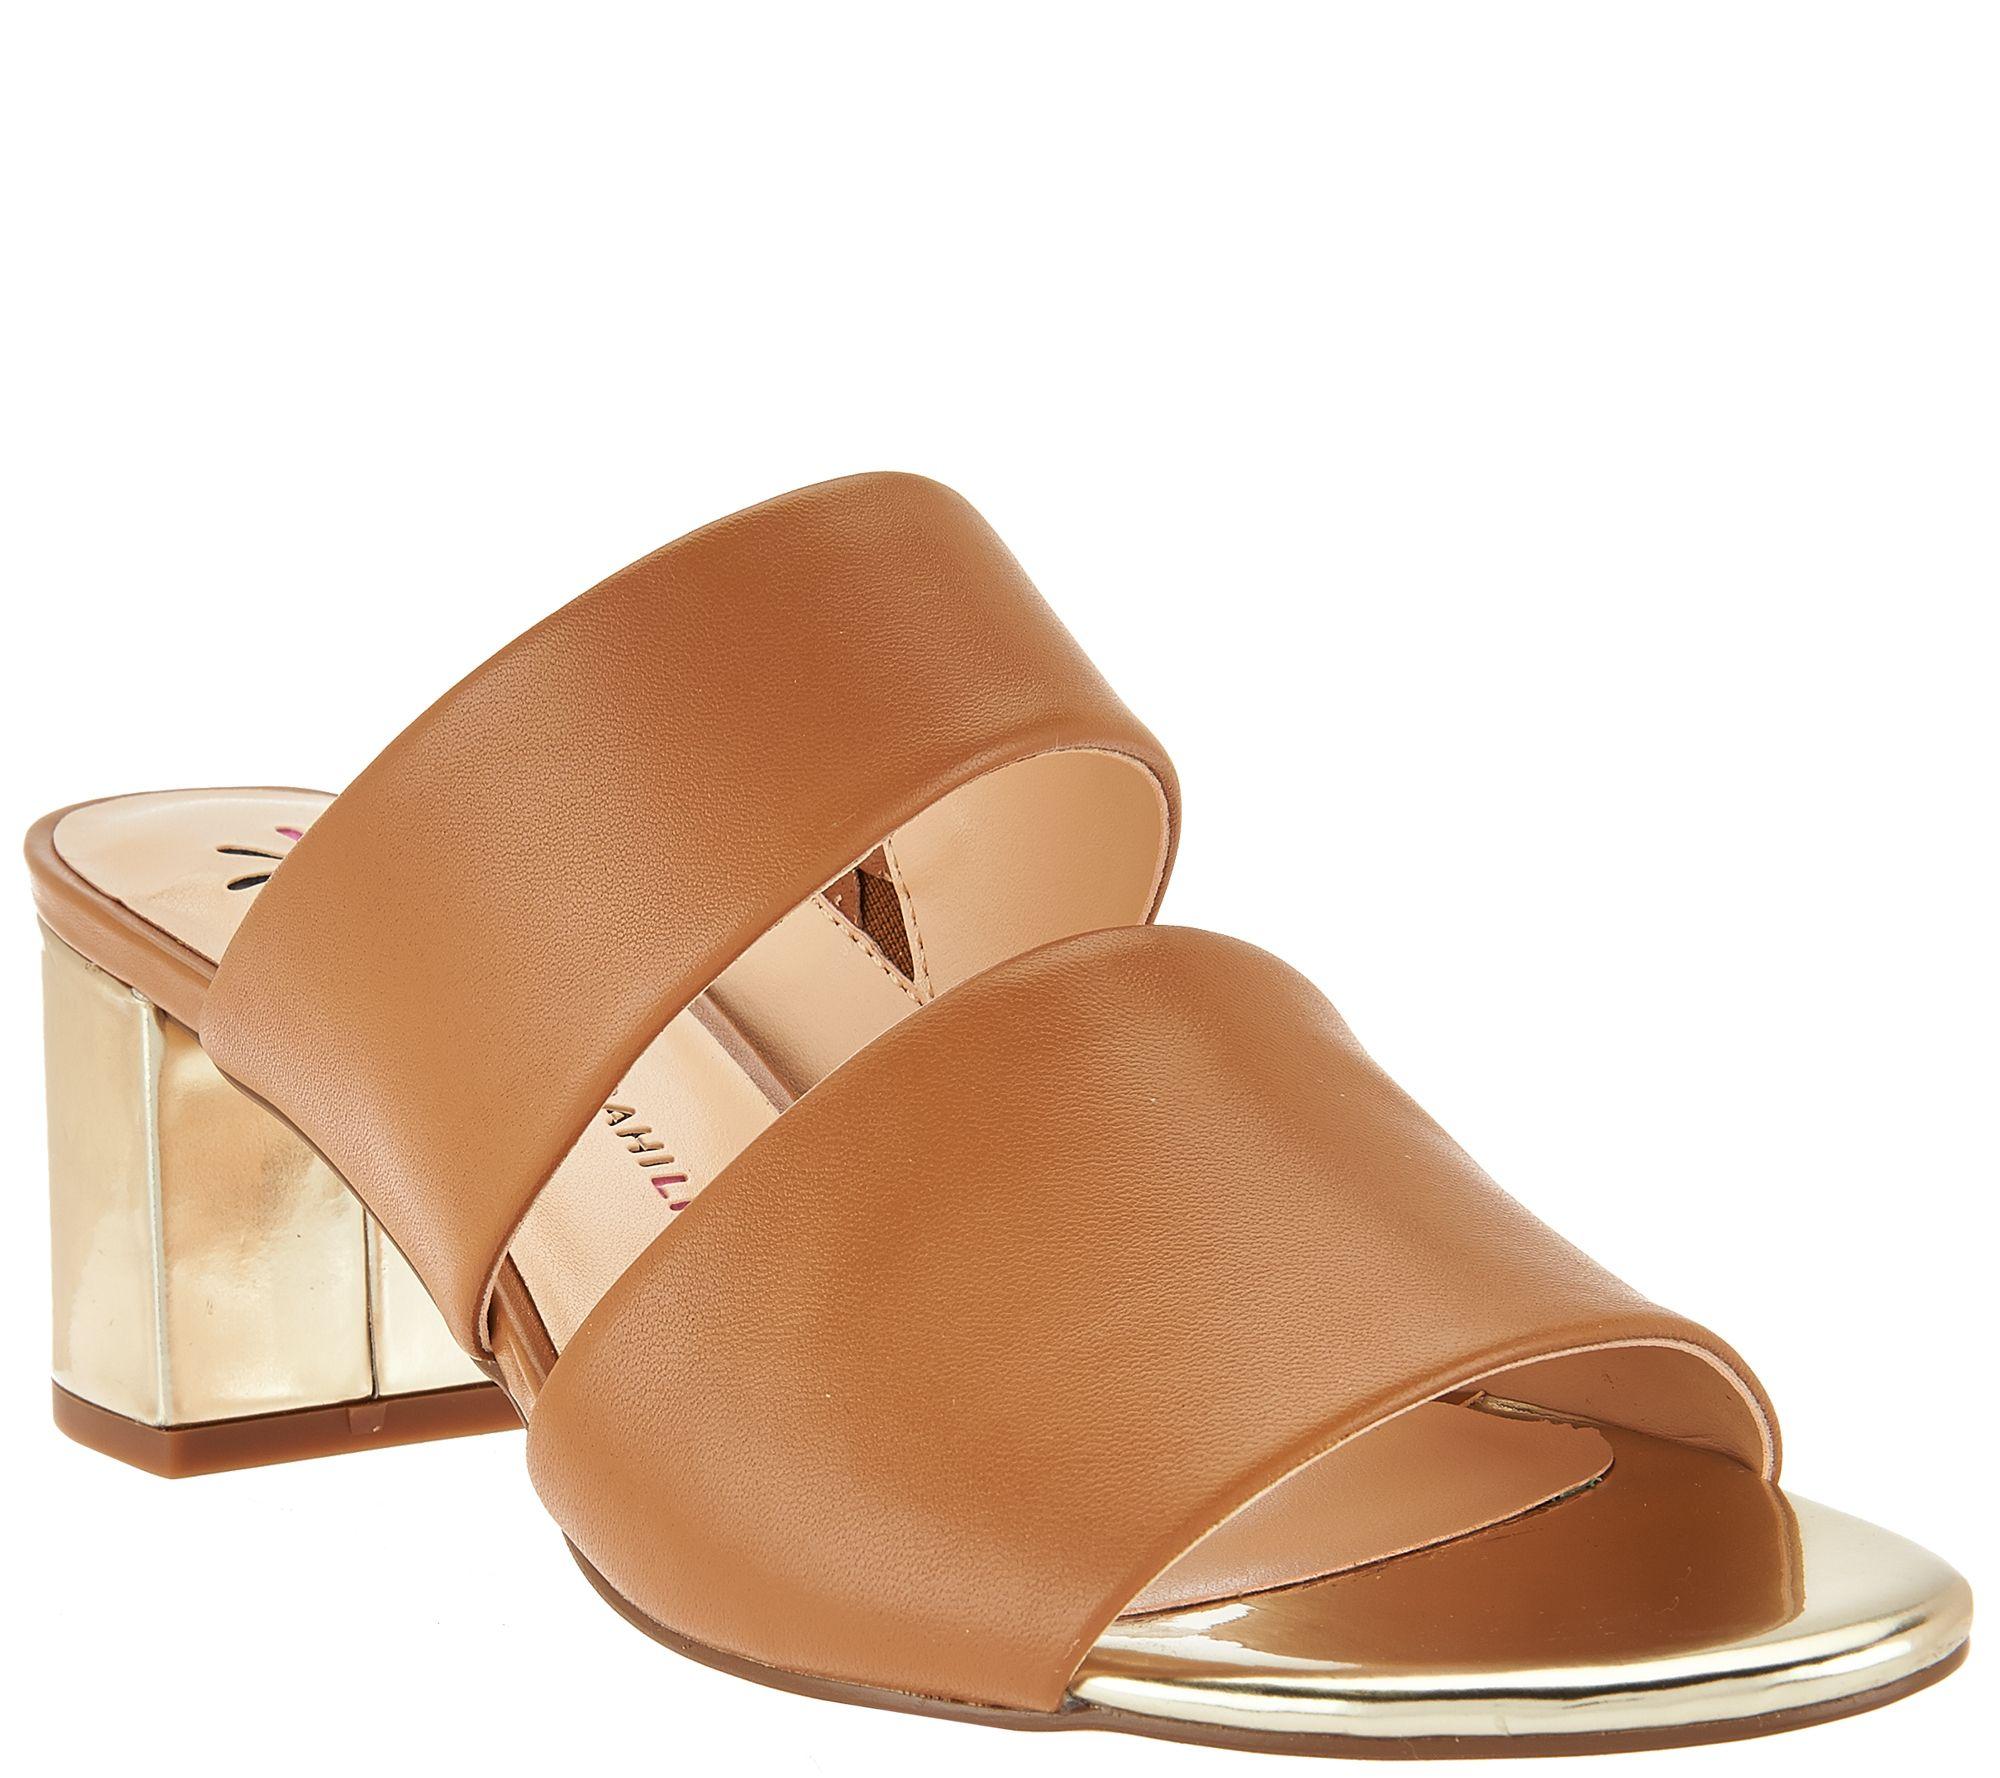 Isaac Mizrahi Live Leather Double Strap Slide Sandals W